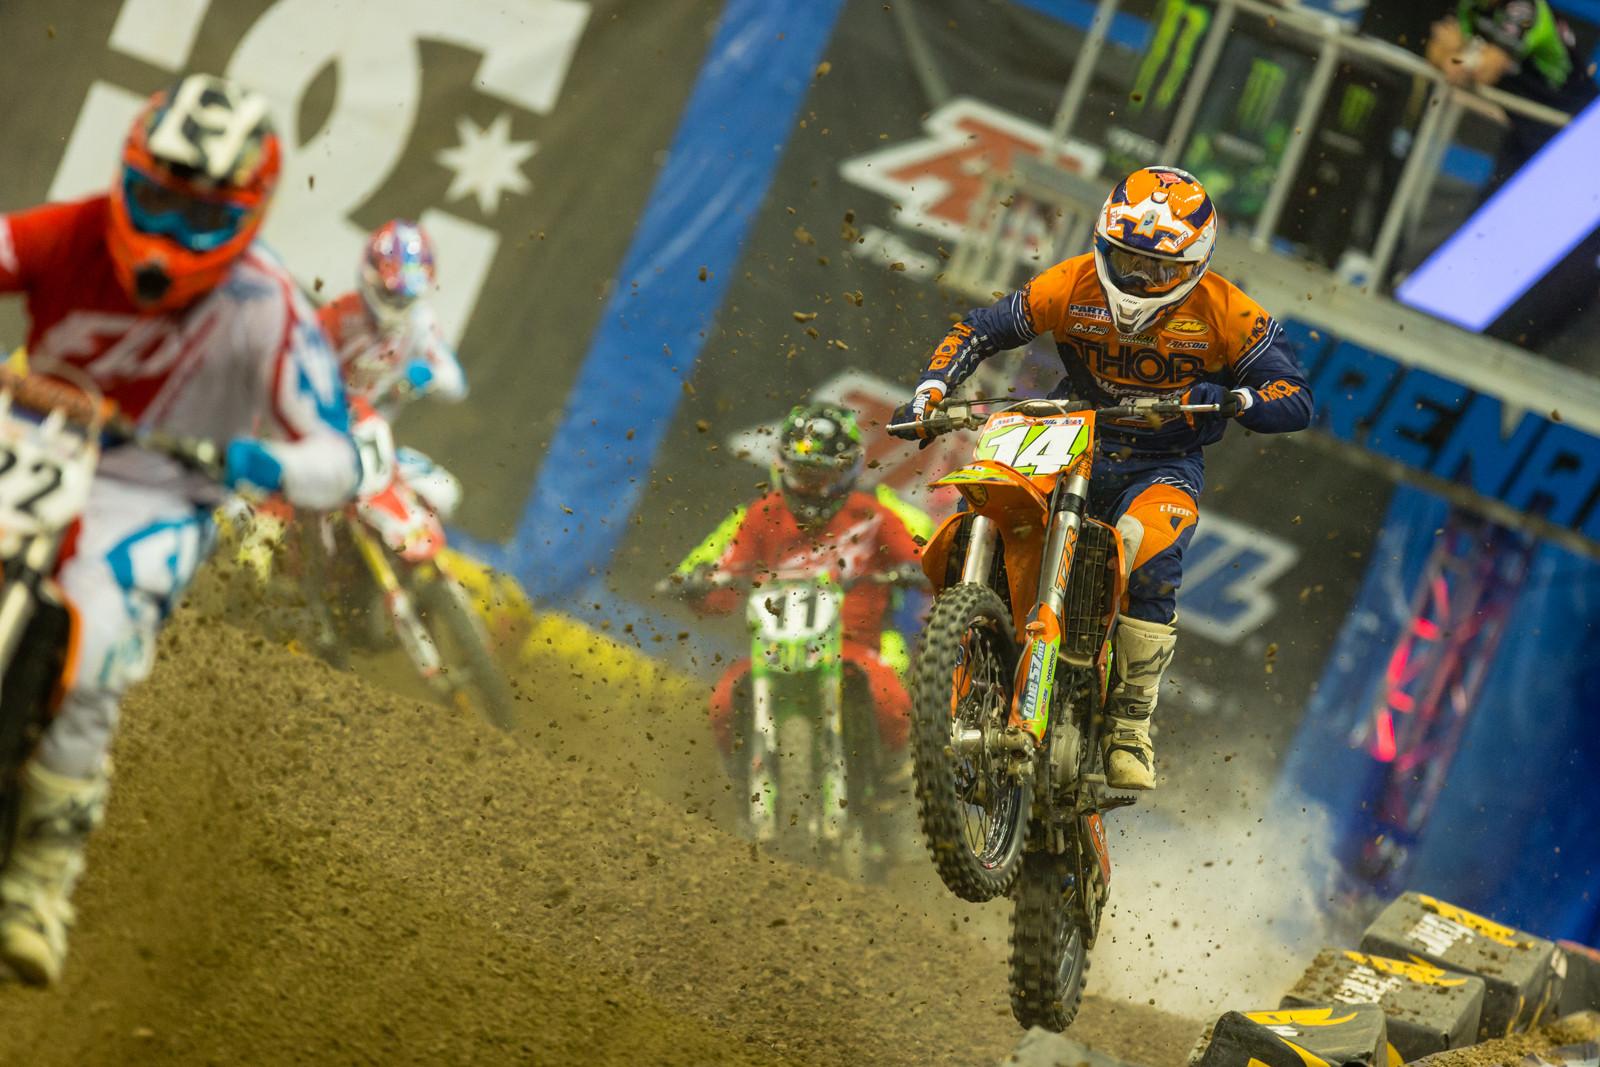 Cody Vanbuskirk - Photo Gallery: Ontario Arenacross - Saturday Night - Motocross Pictures - Vital MX